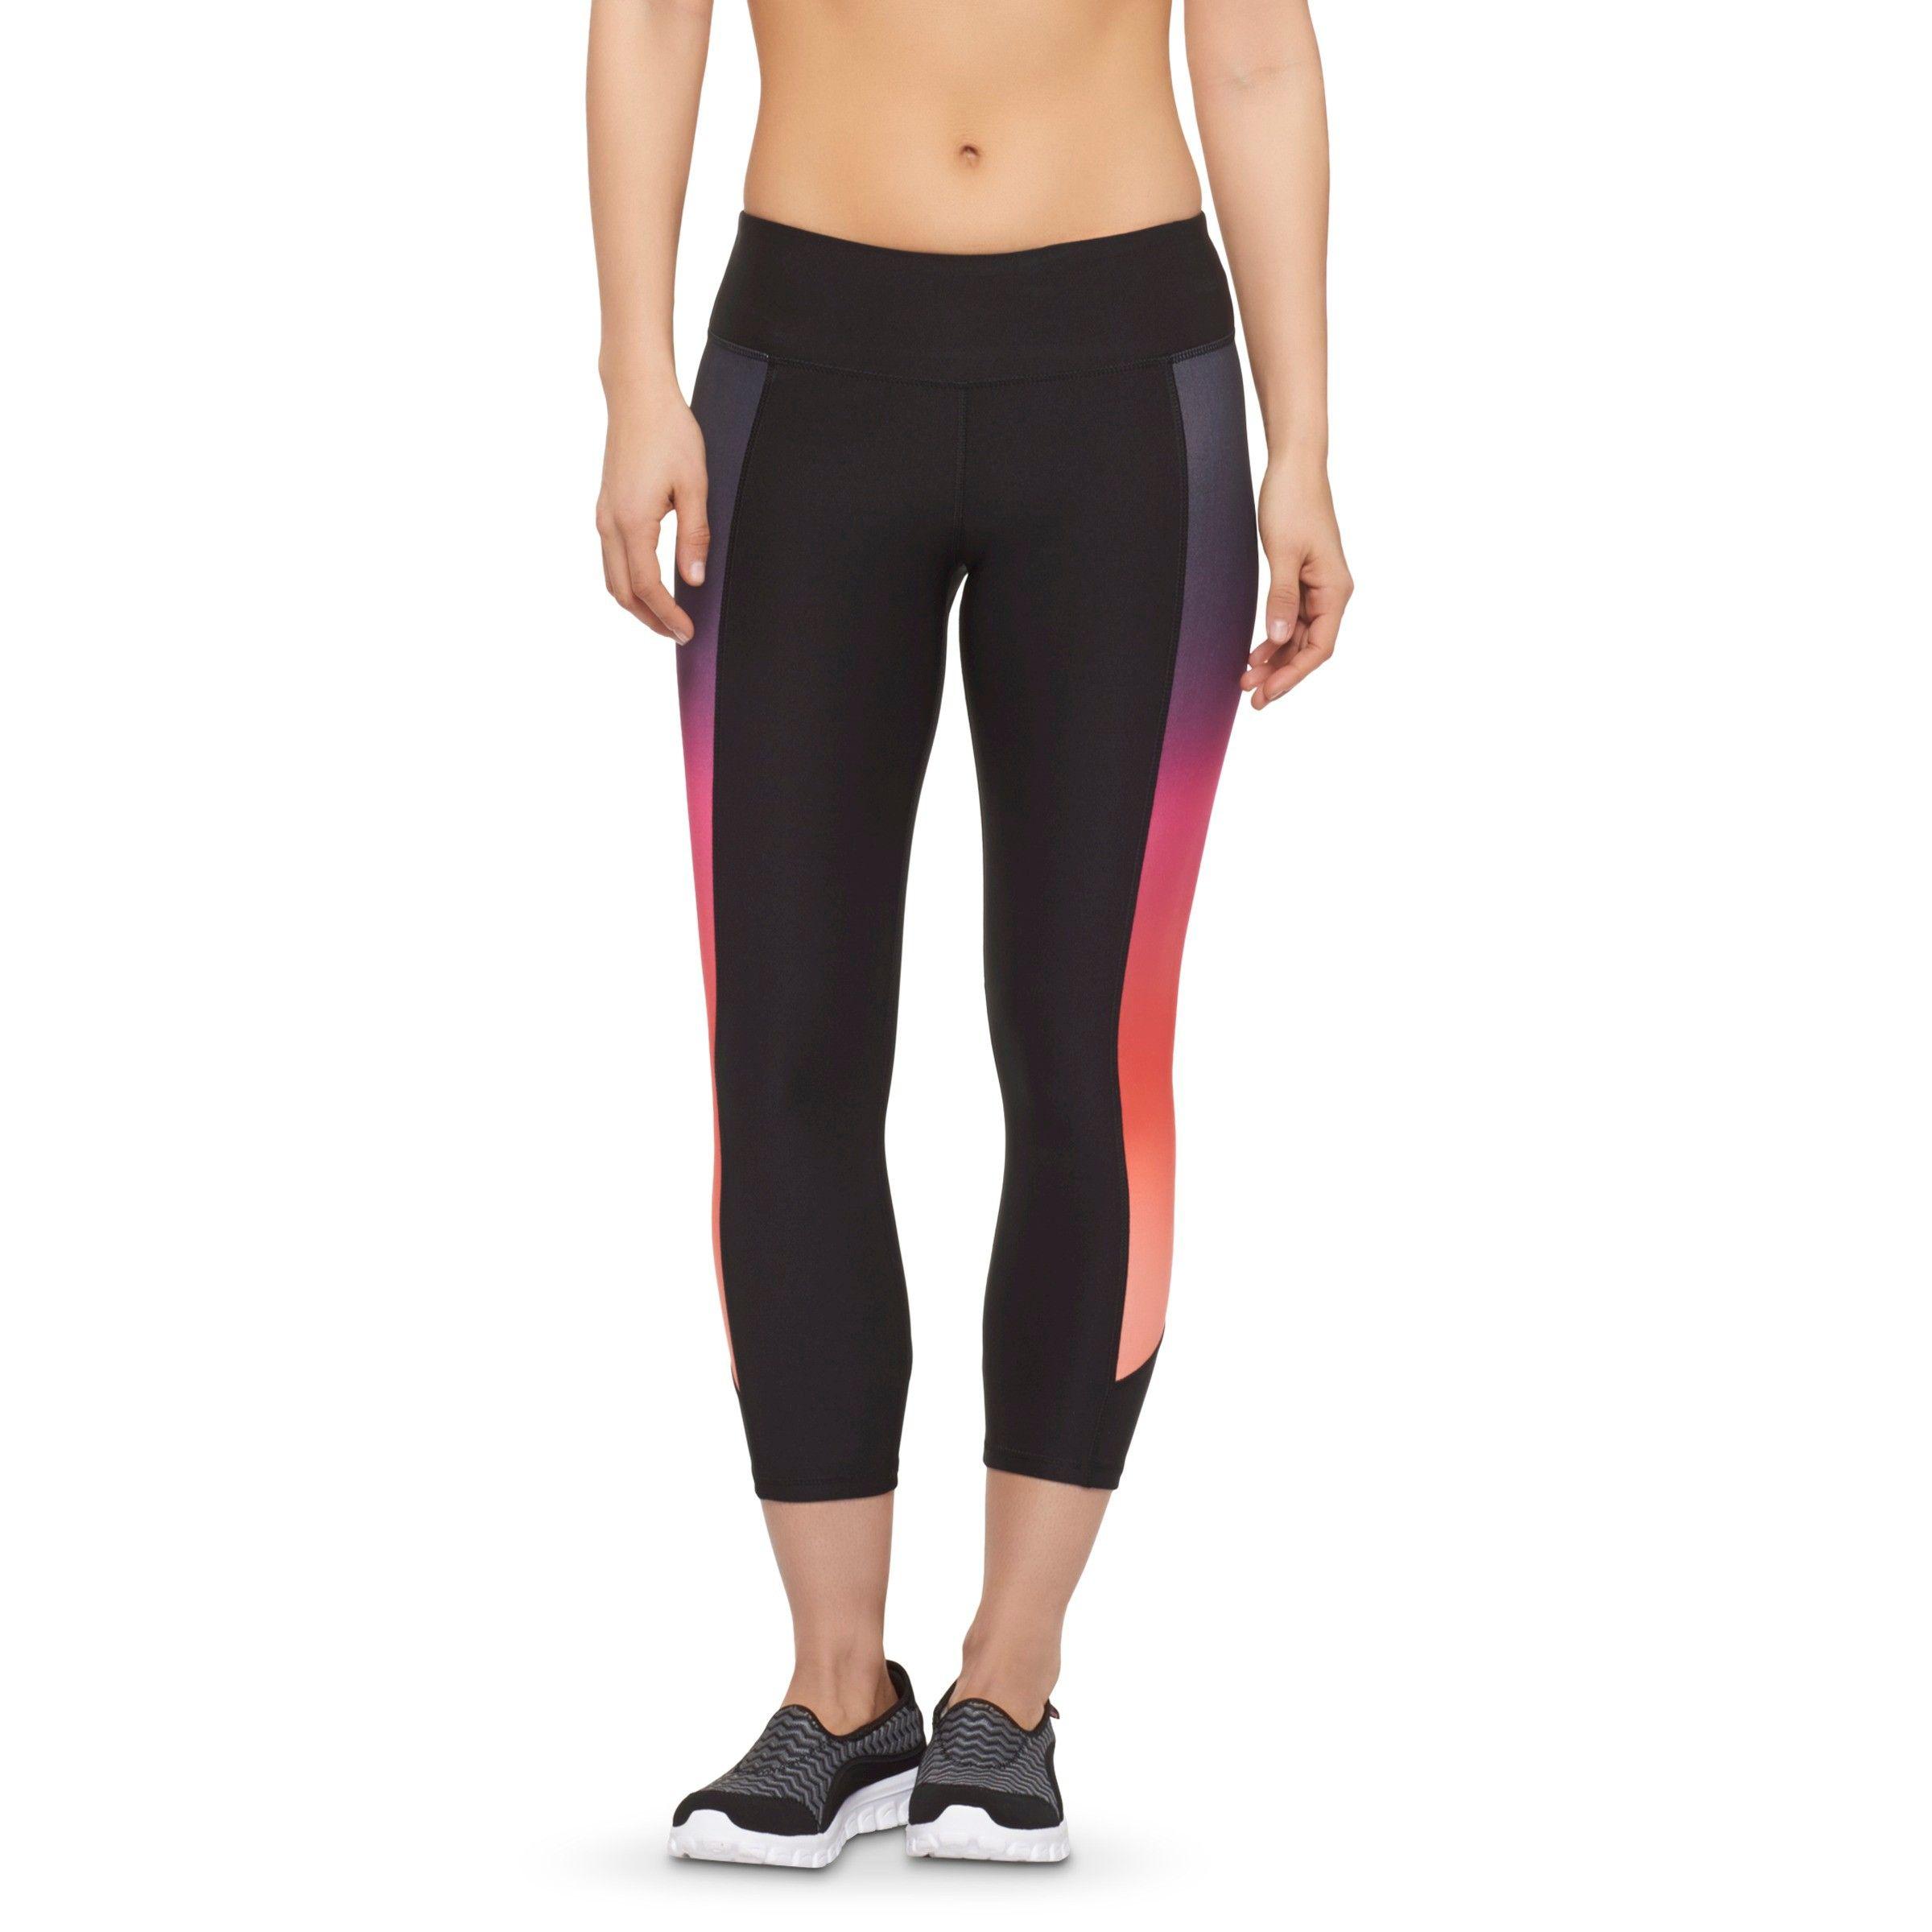 Women's Multi-Color Ombre Insert Yoga Capri - RBX : Target